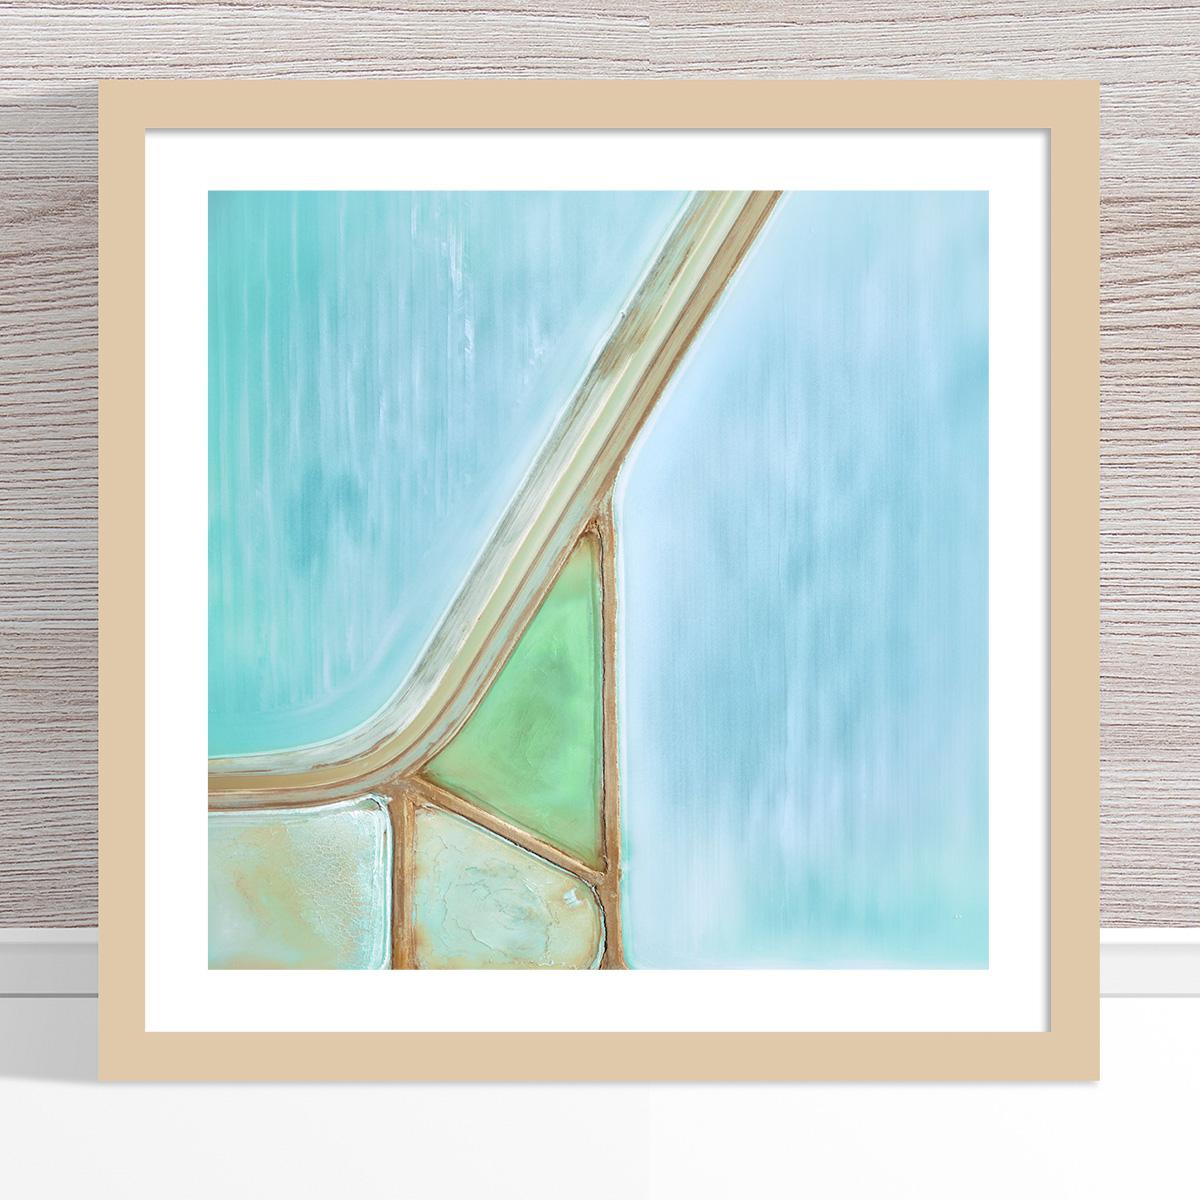 Chris Saunders - 'Aerial Salt 028' Light Frame